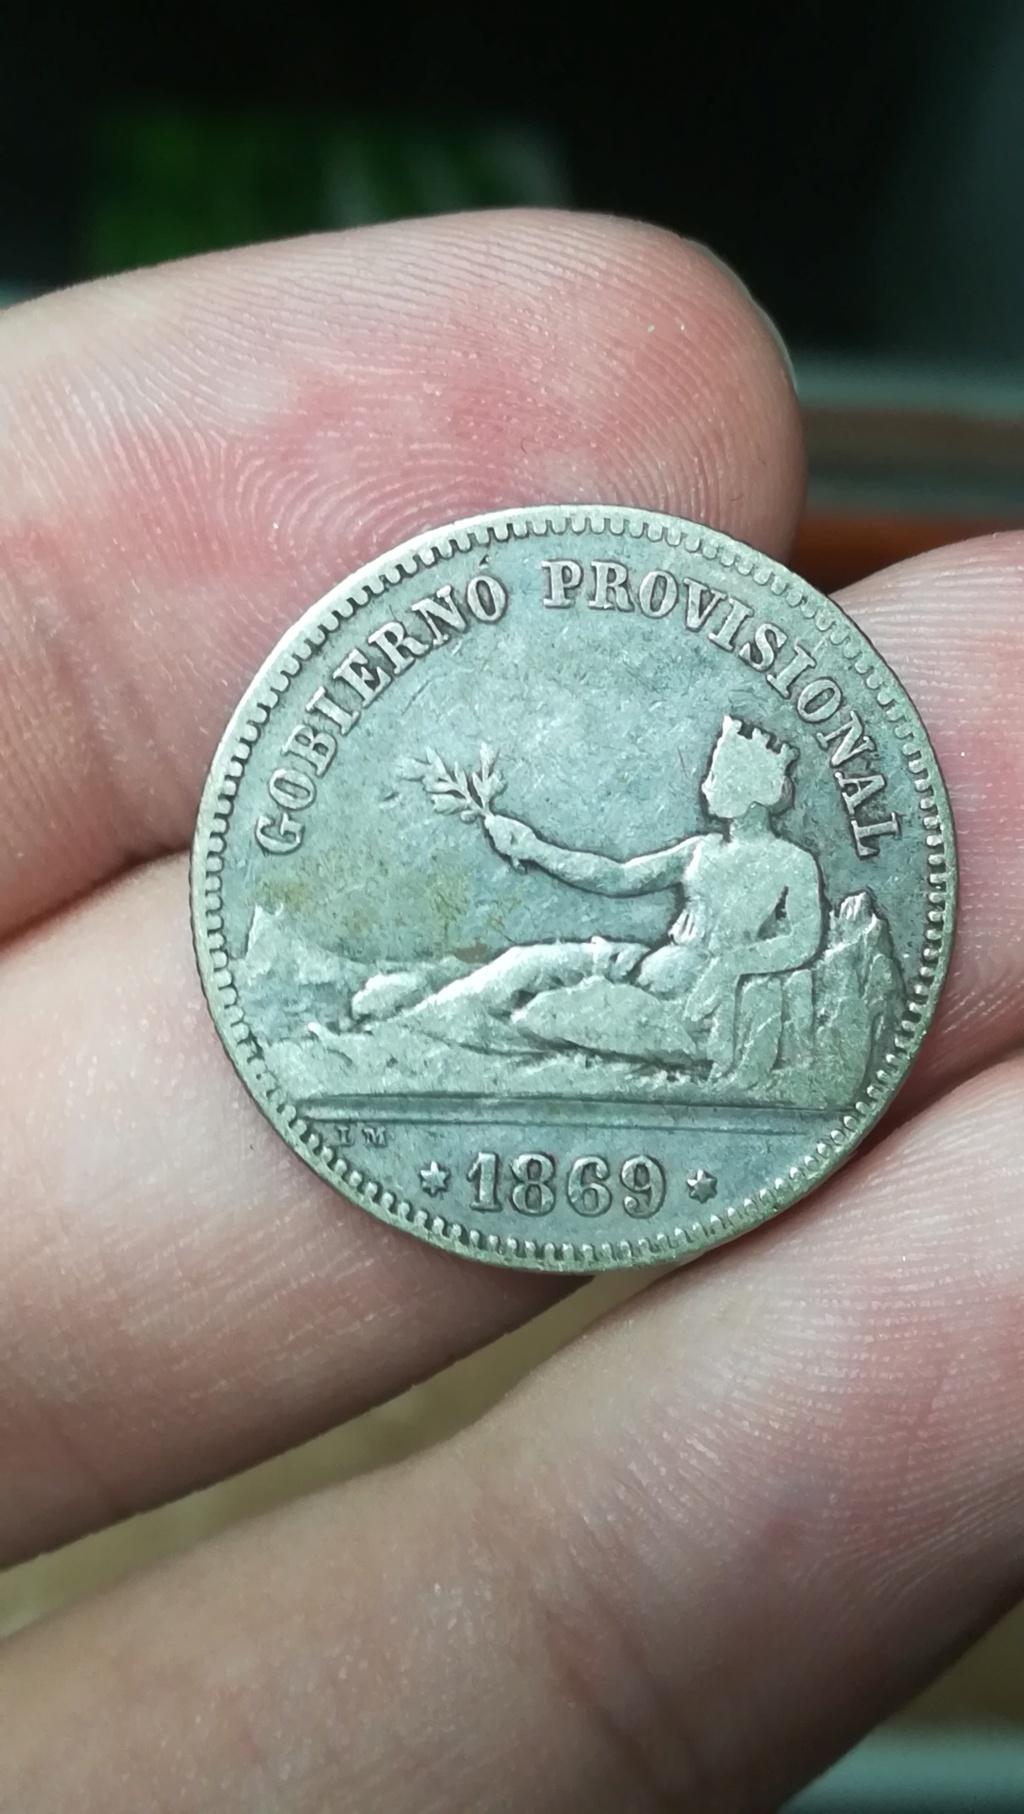 UNA PESETA GOBIERNO PROVISIONAL 1869 (conejo) 210